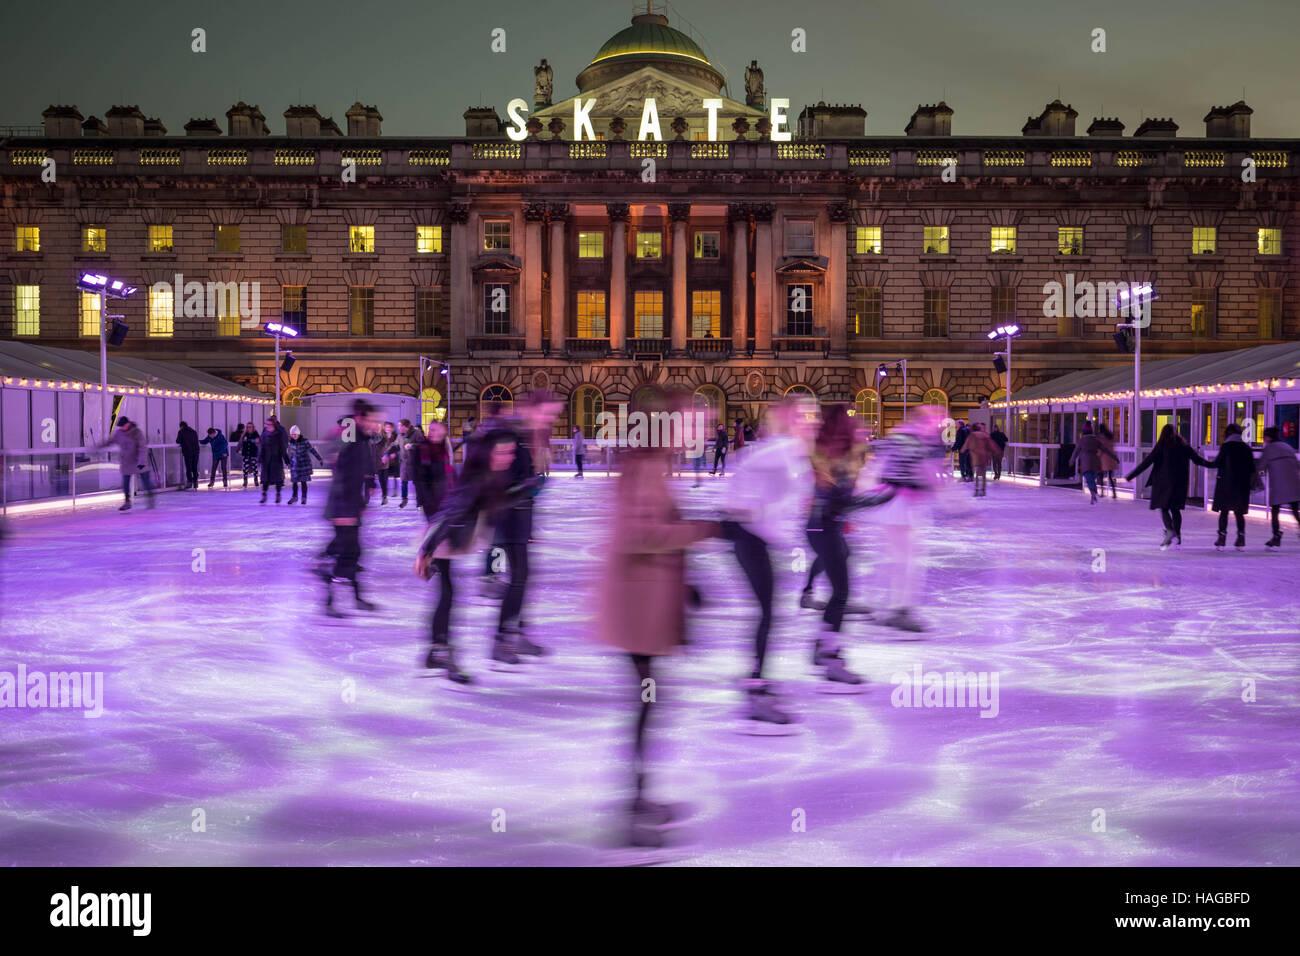 London, UK. 30th Nov, 2016. Somerset House Ice Rink Credit:  Guy Corbishley/Alamy Live News - Stock Image